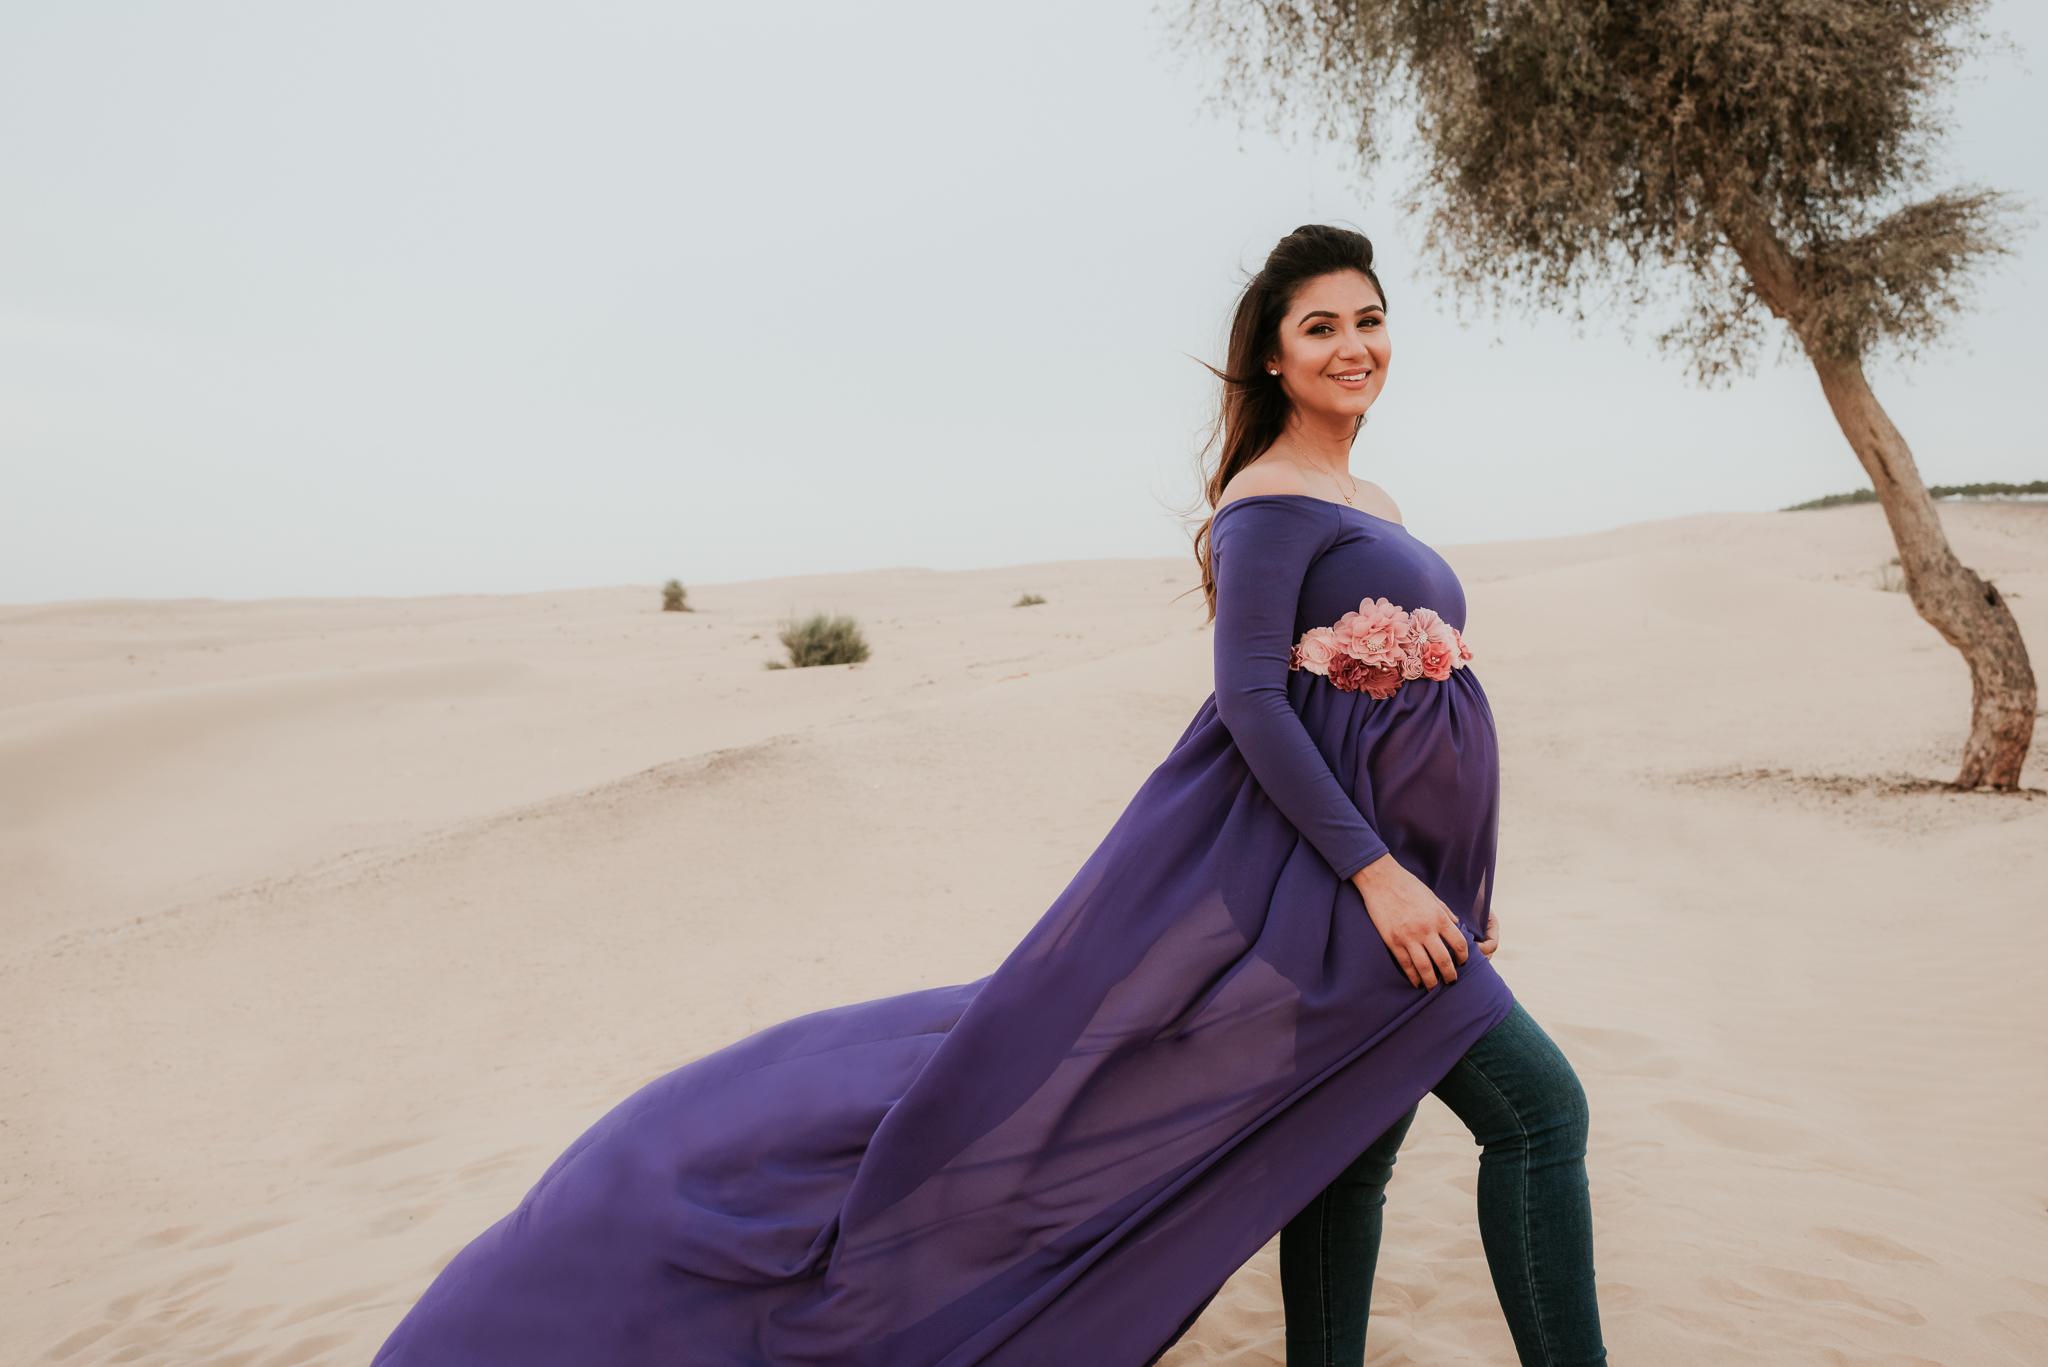 Lana-Photographs-Dubai-Maternity-Photographer-FatimaE-PSLR-56.jpg